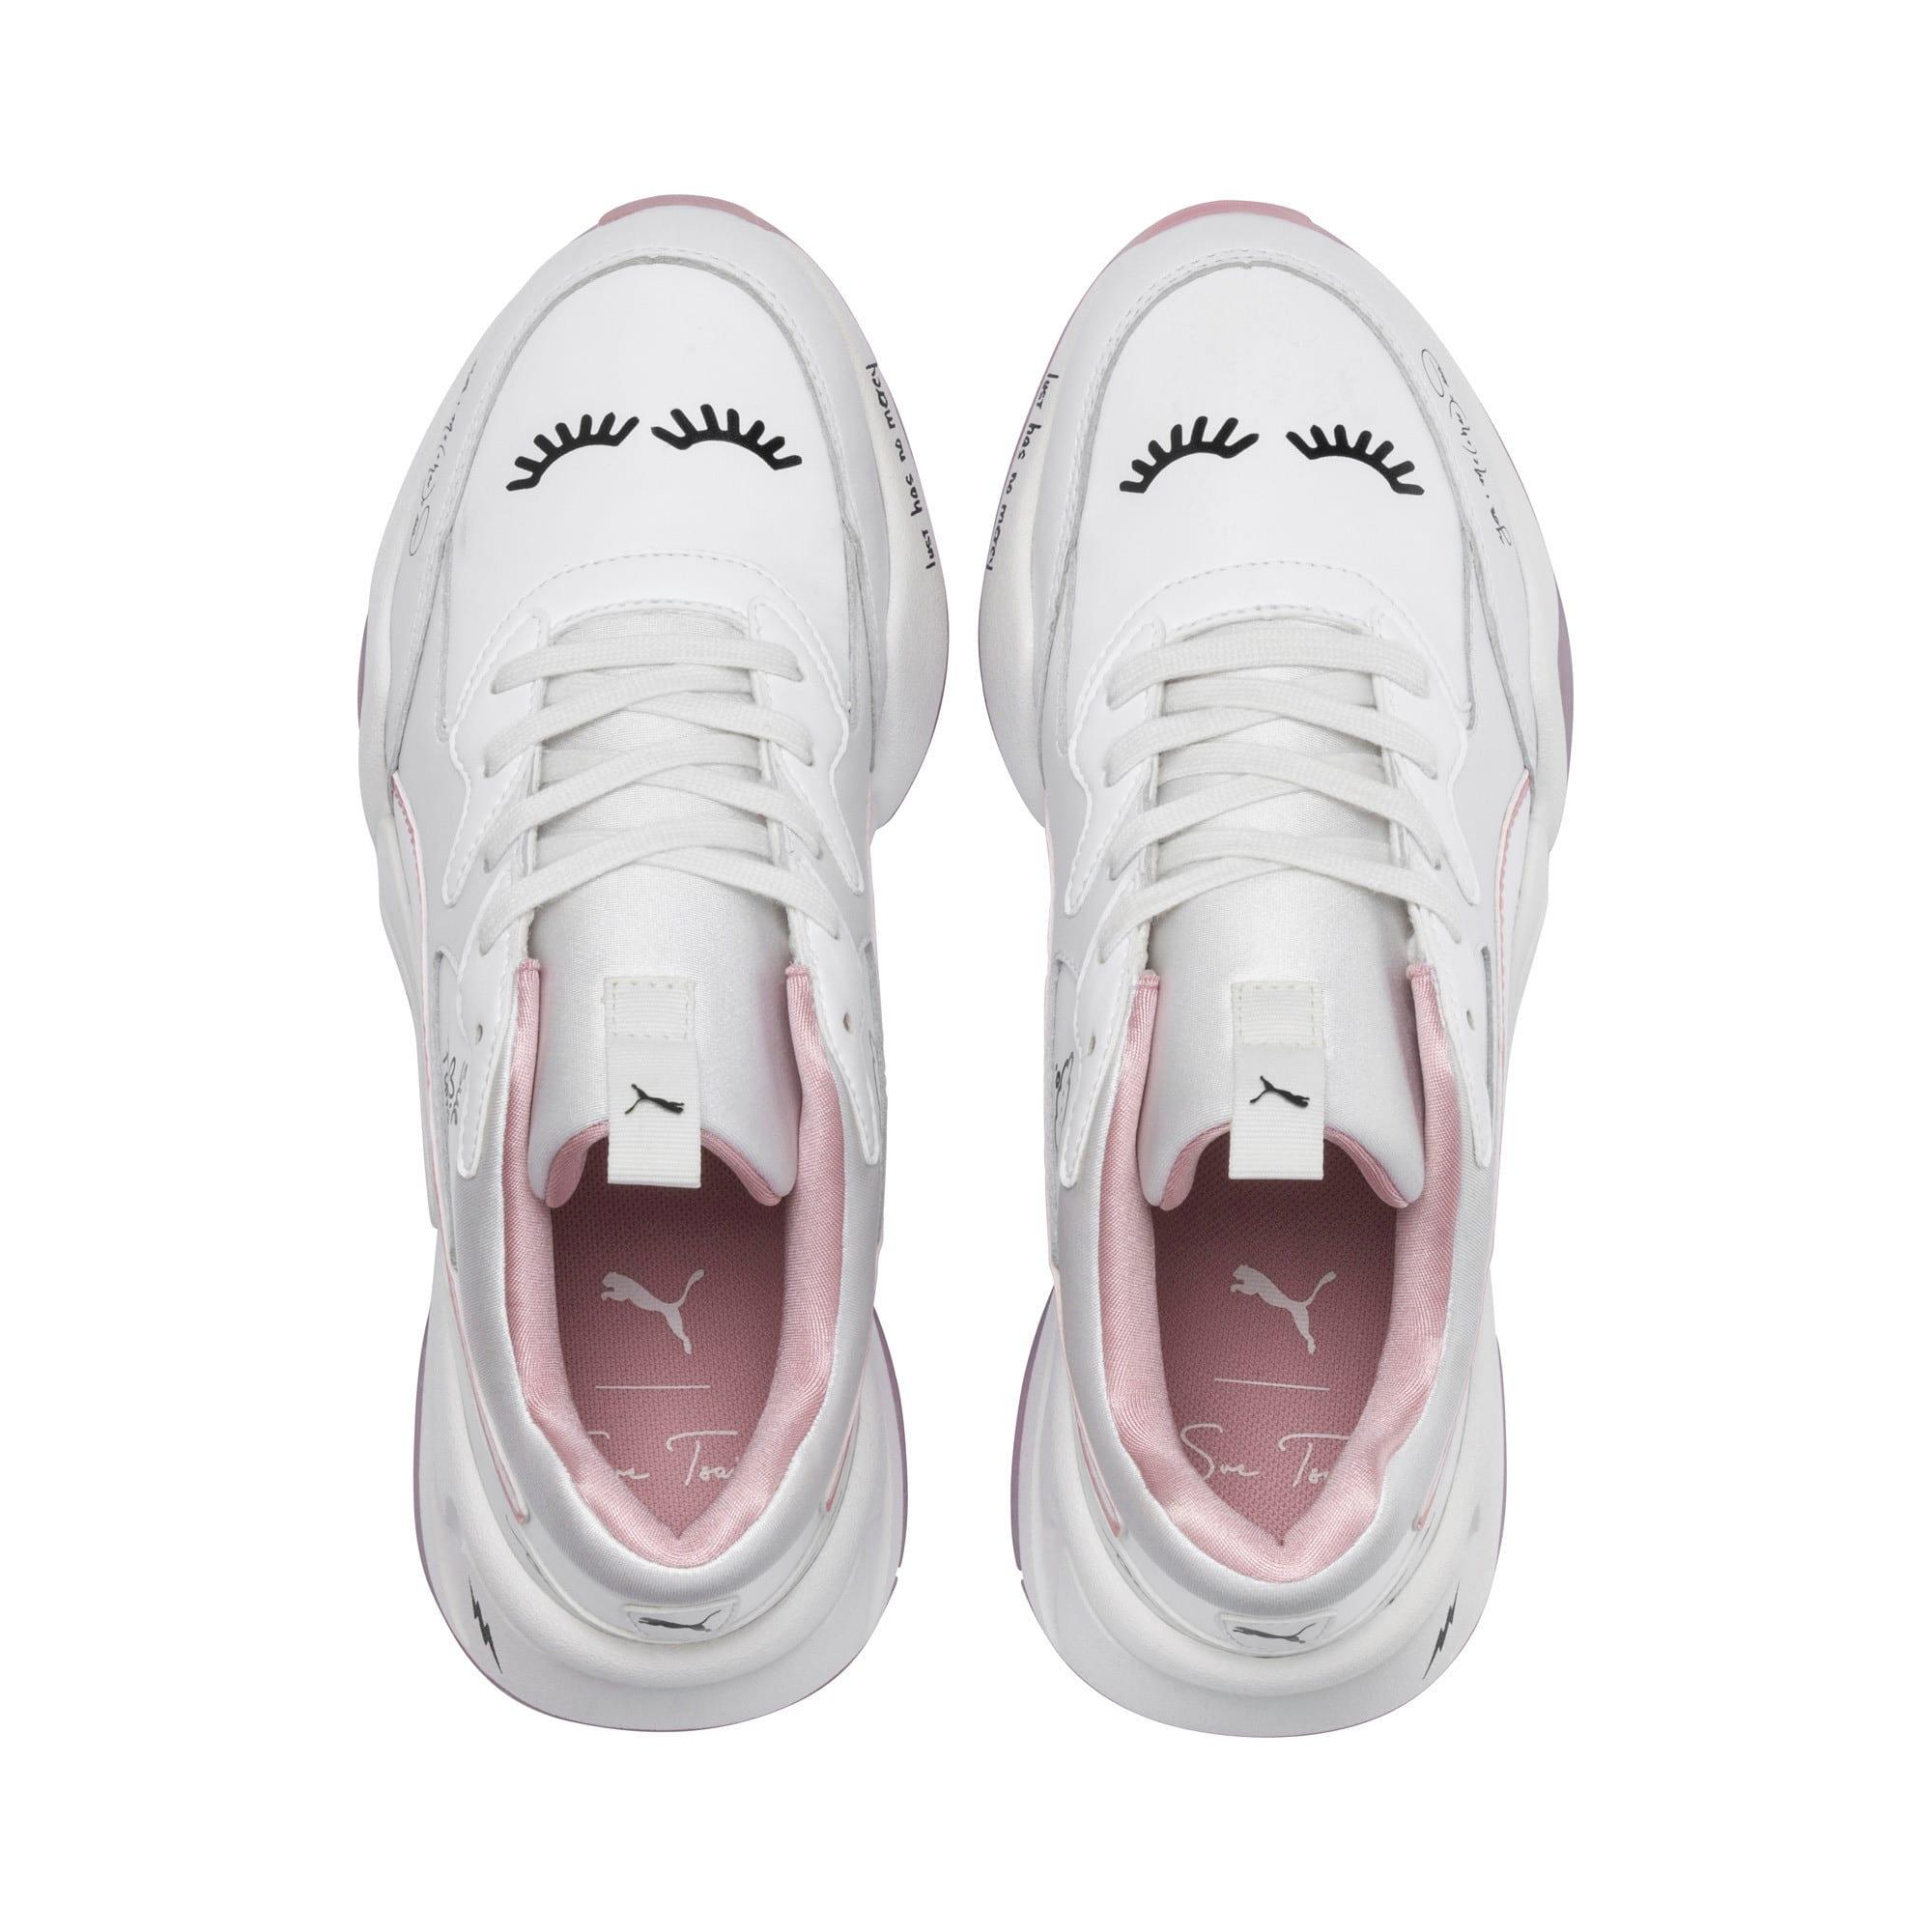 Thumbnail 6 of PUMA x SUE TSAI Nova Women's Sneakers, Bright White-Bright White, medium